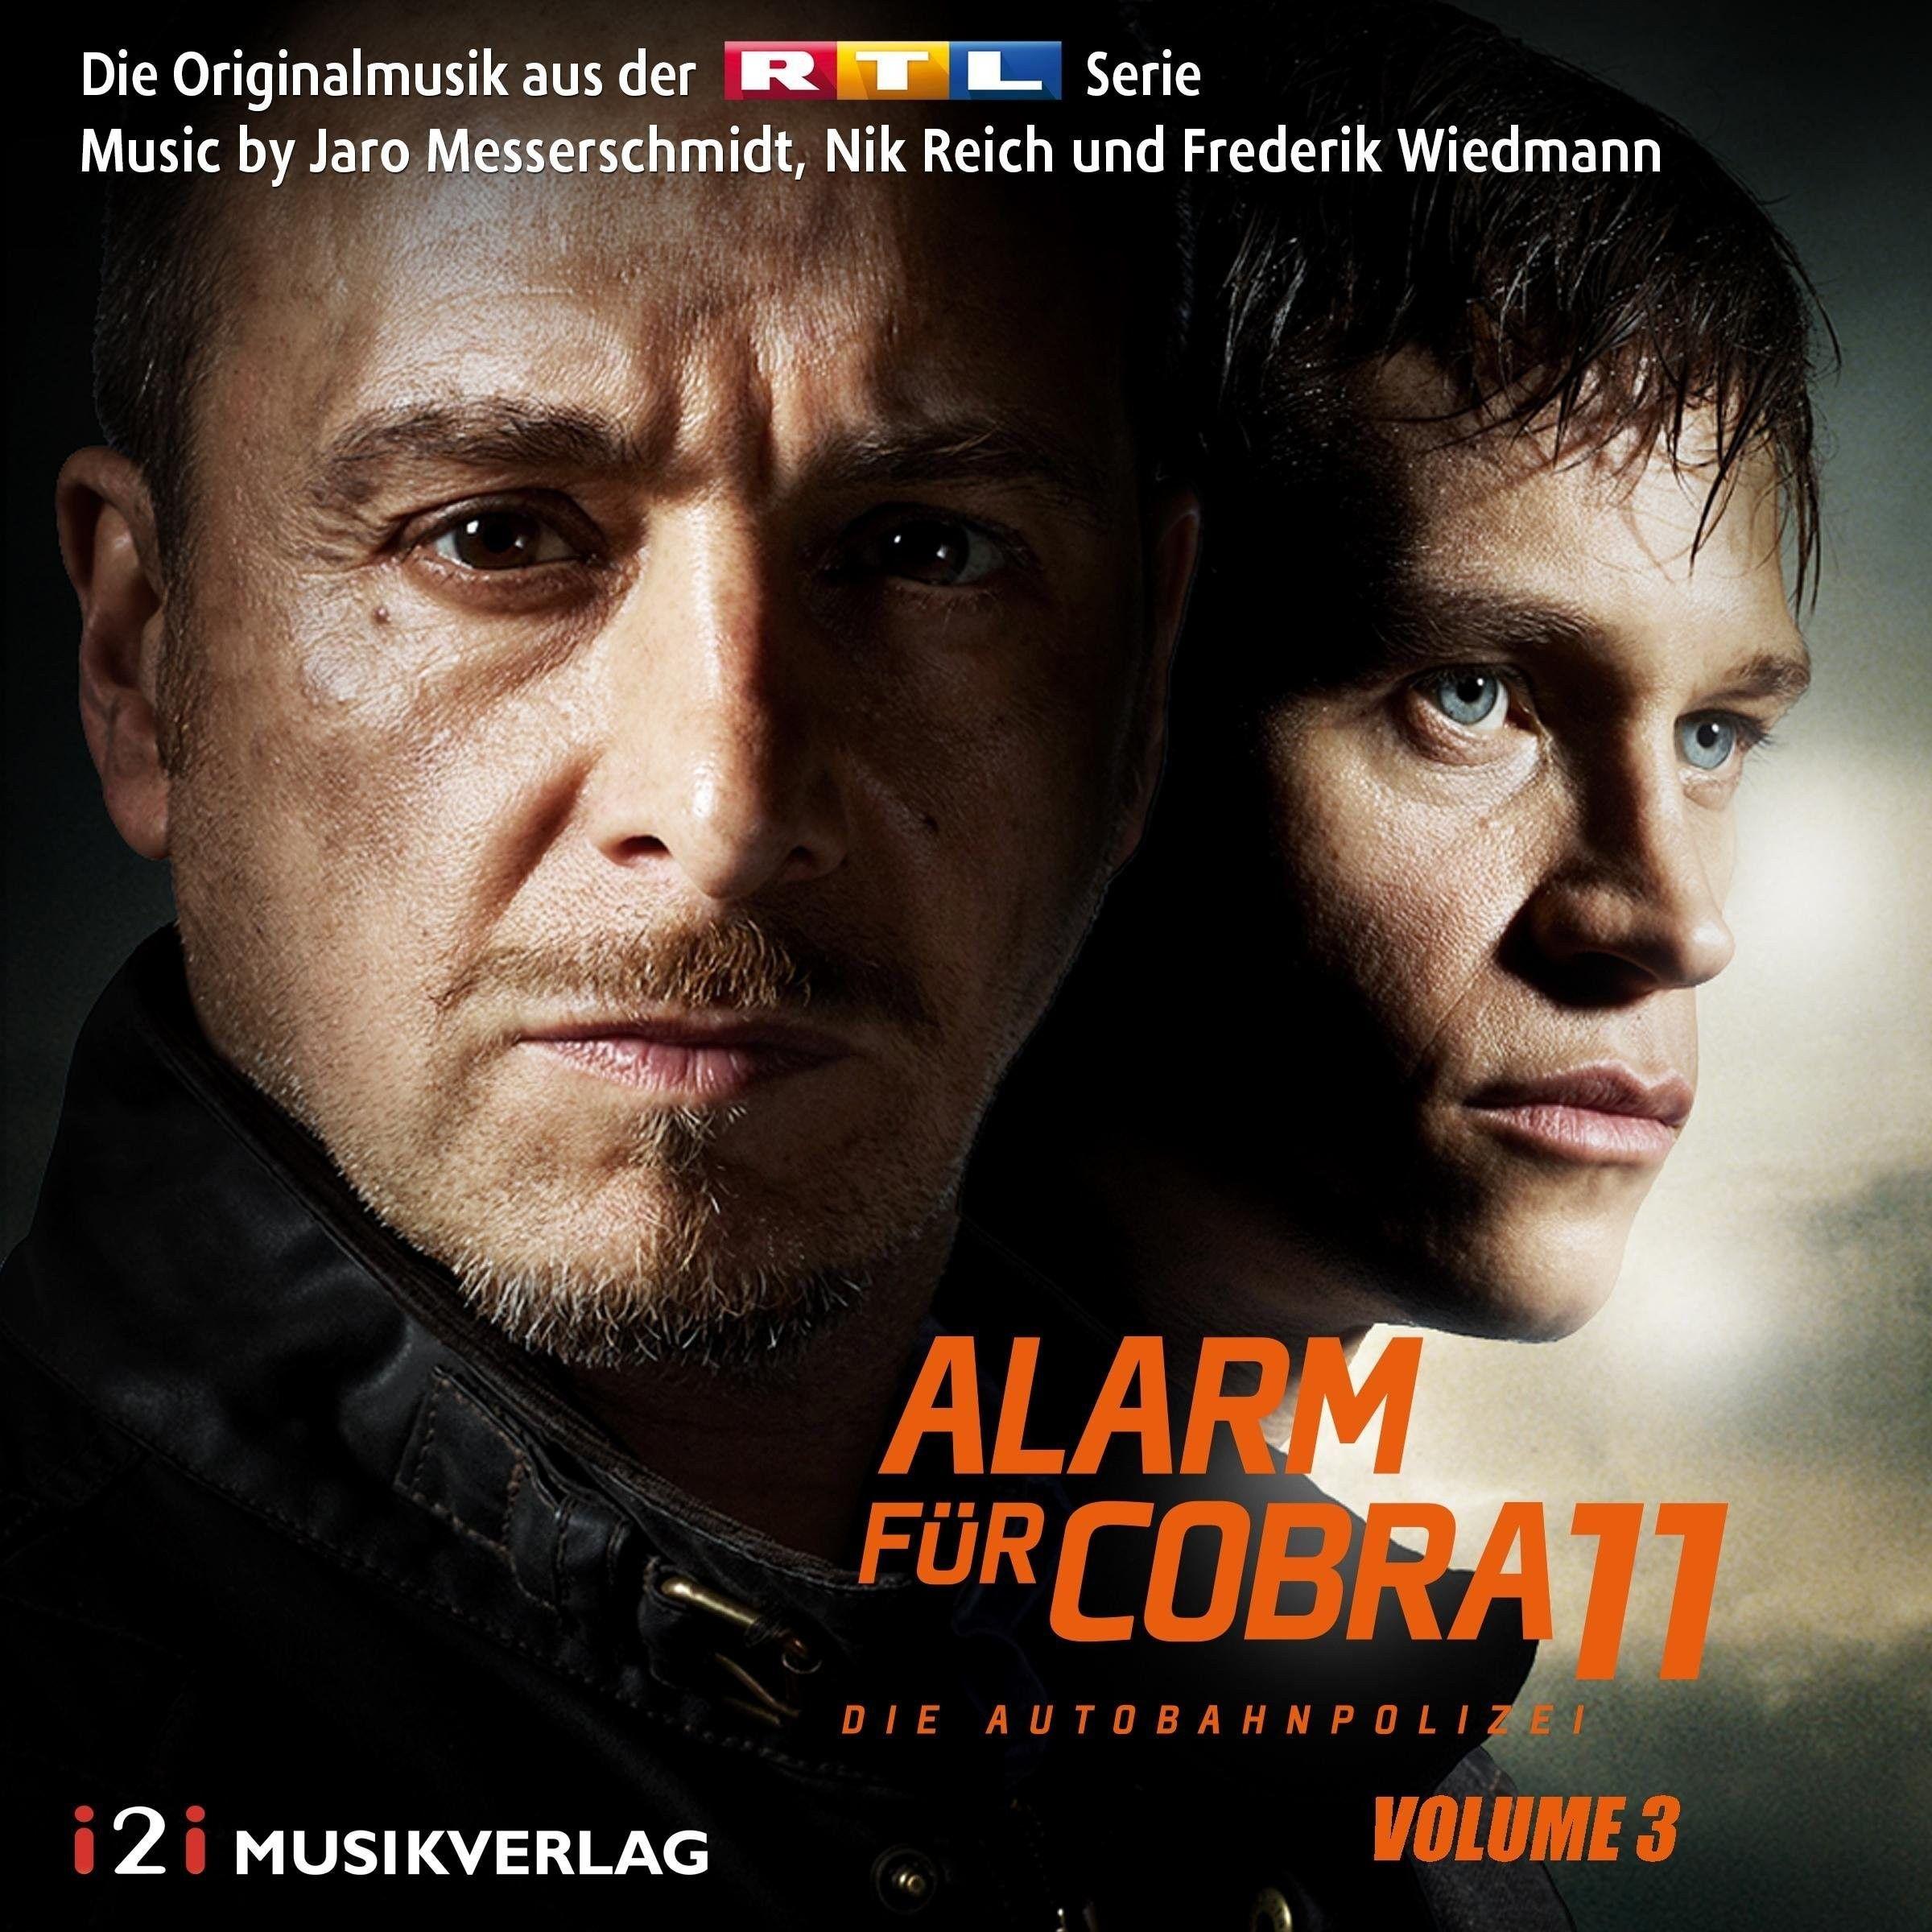 Alarm Für Cobra 11 Playboy